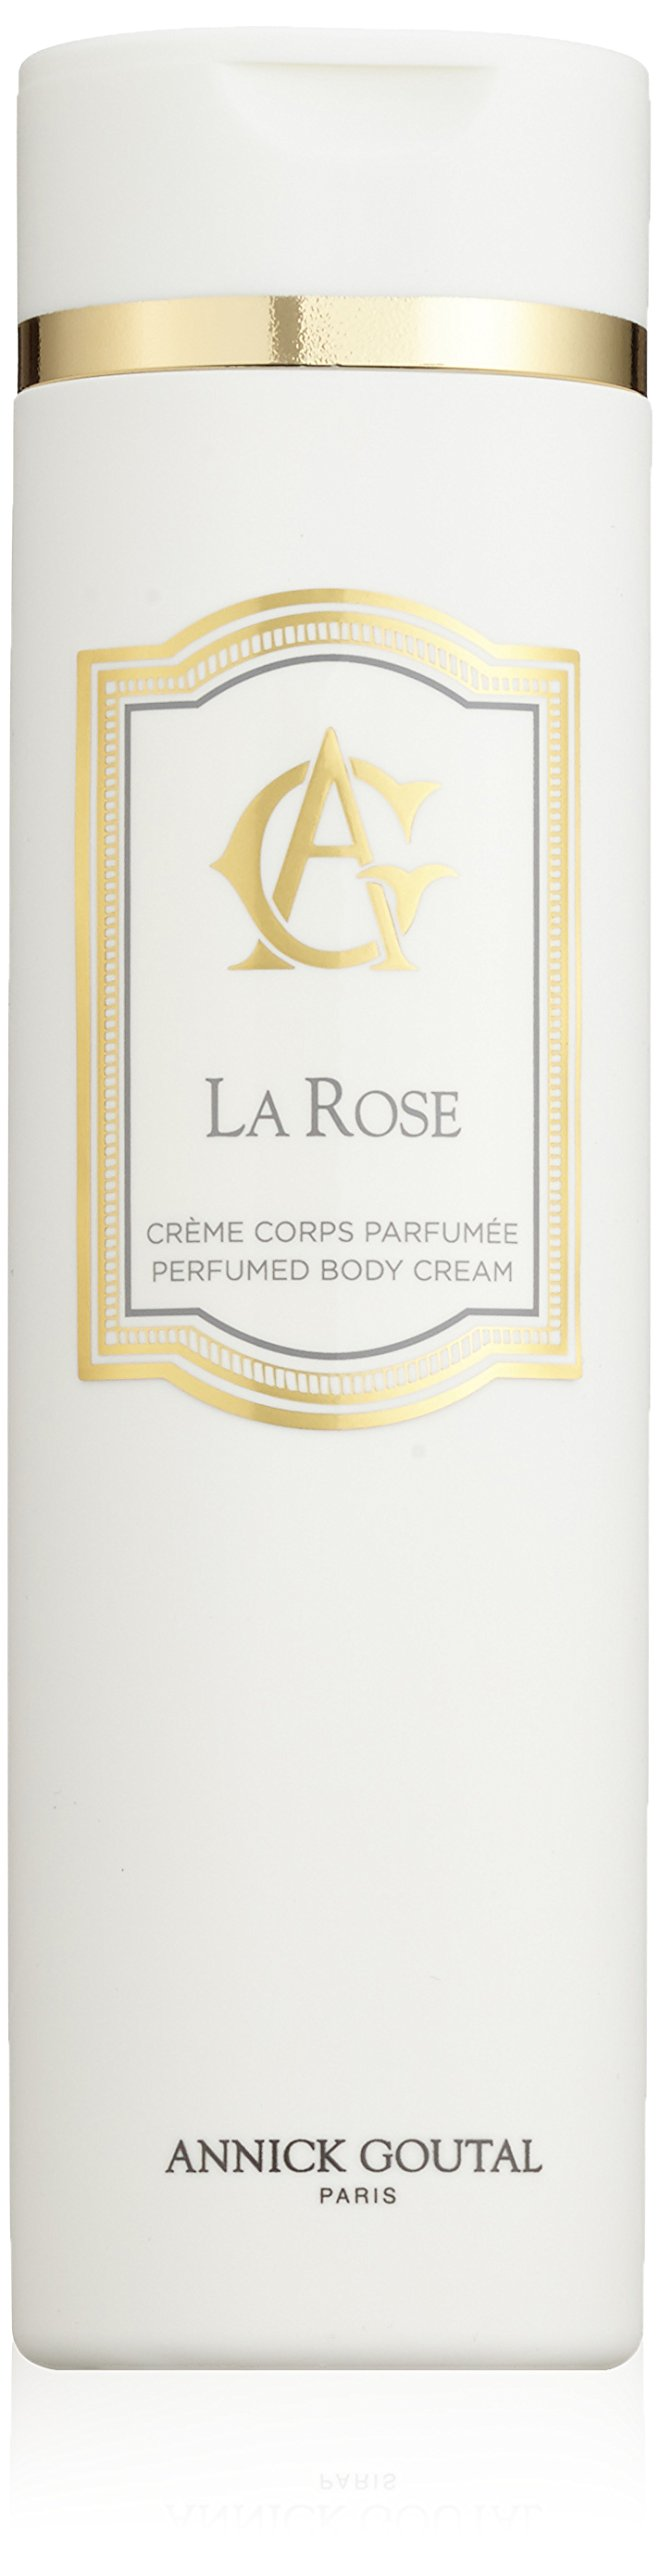 Annick Goutal La Rose for Women Body Cream, 6.8 Ounce